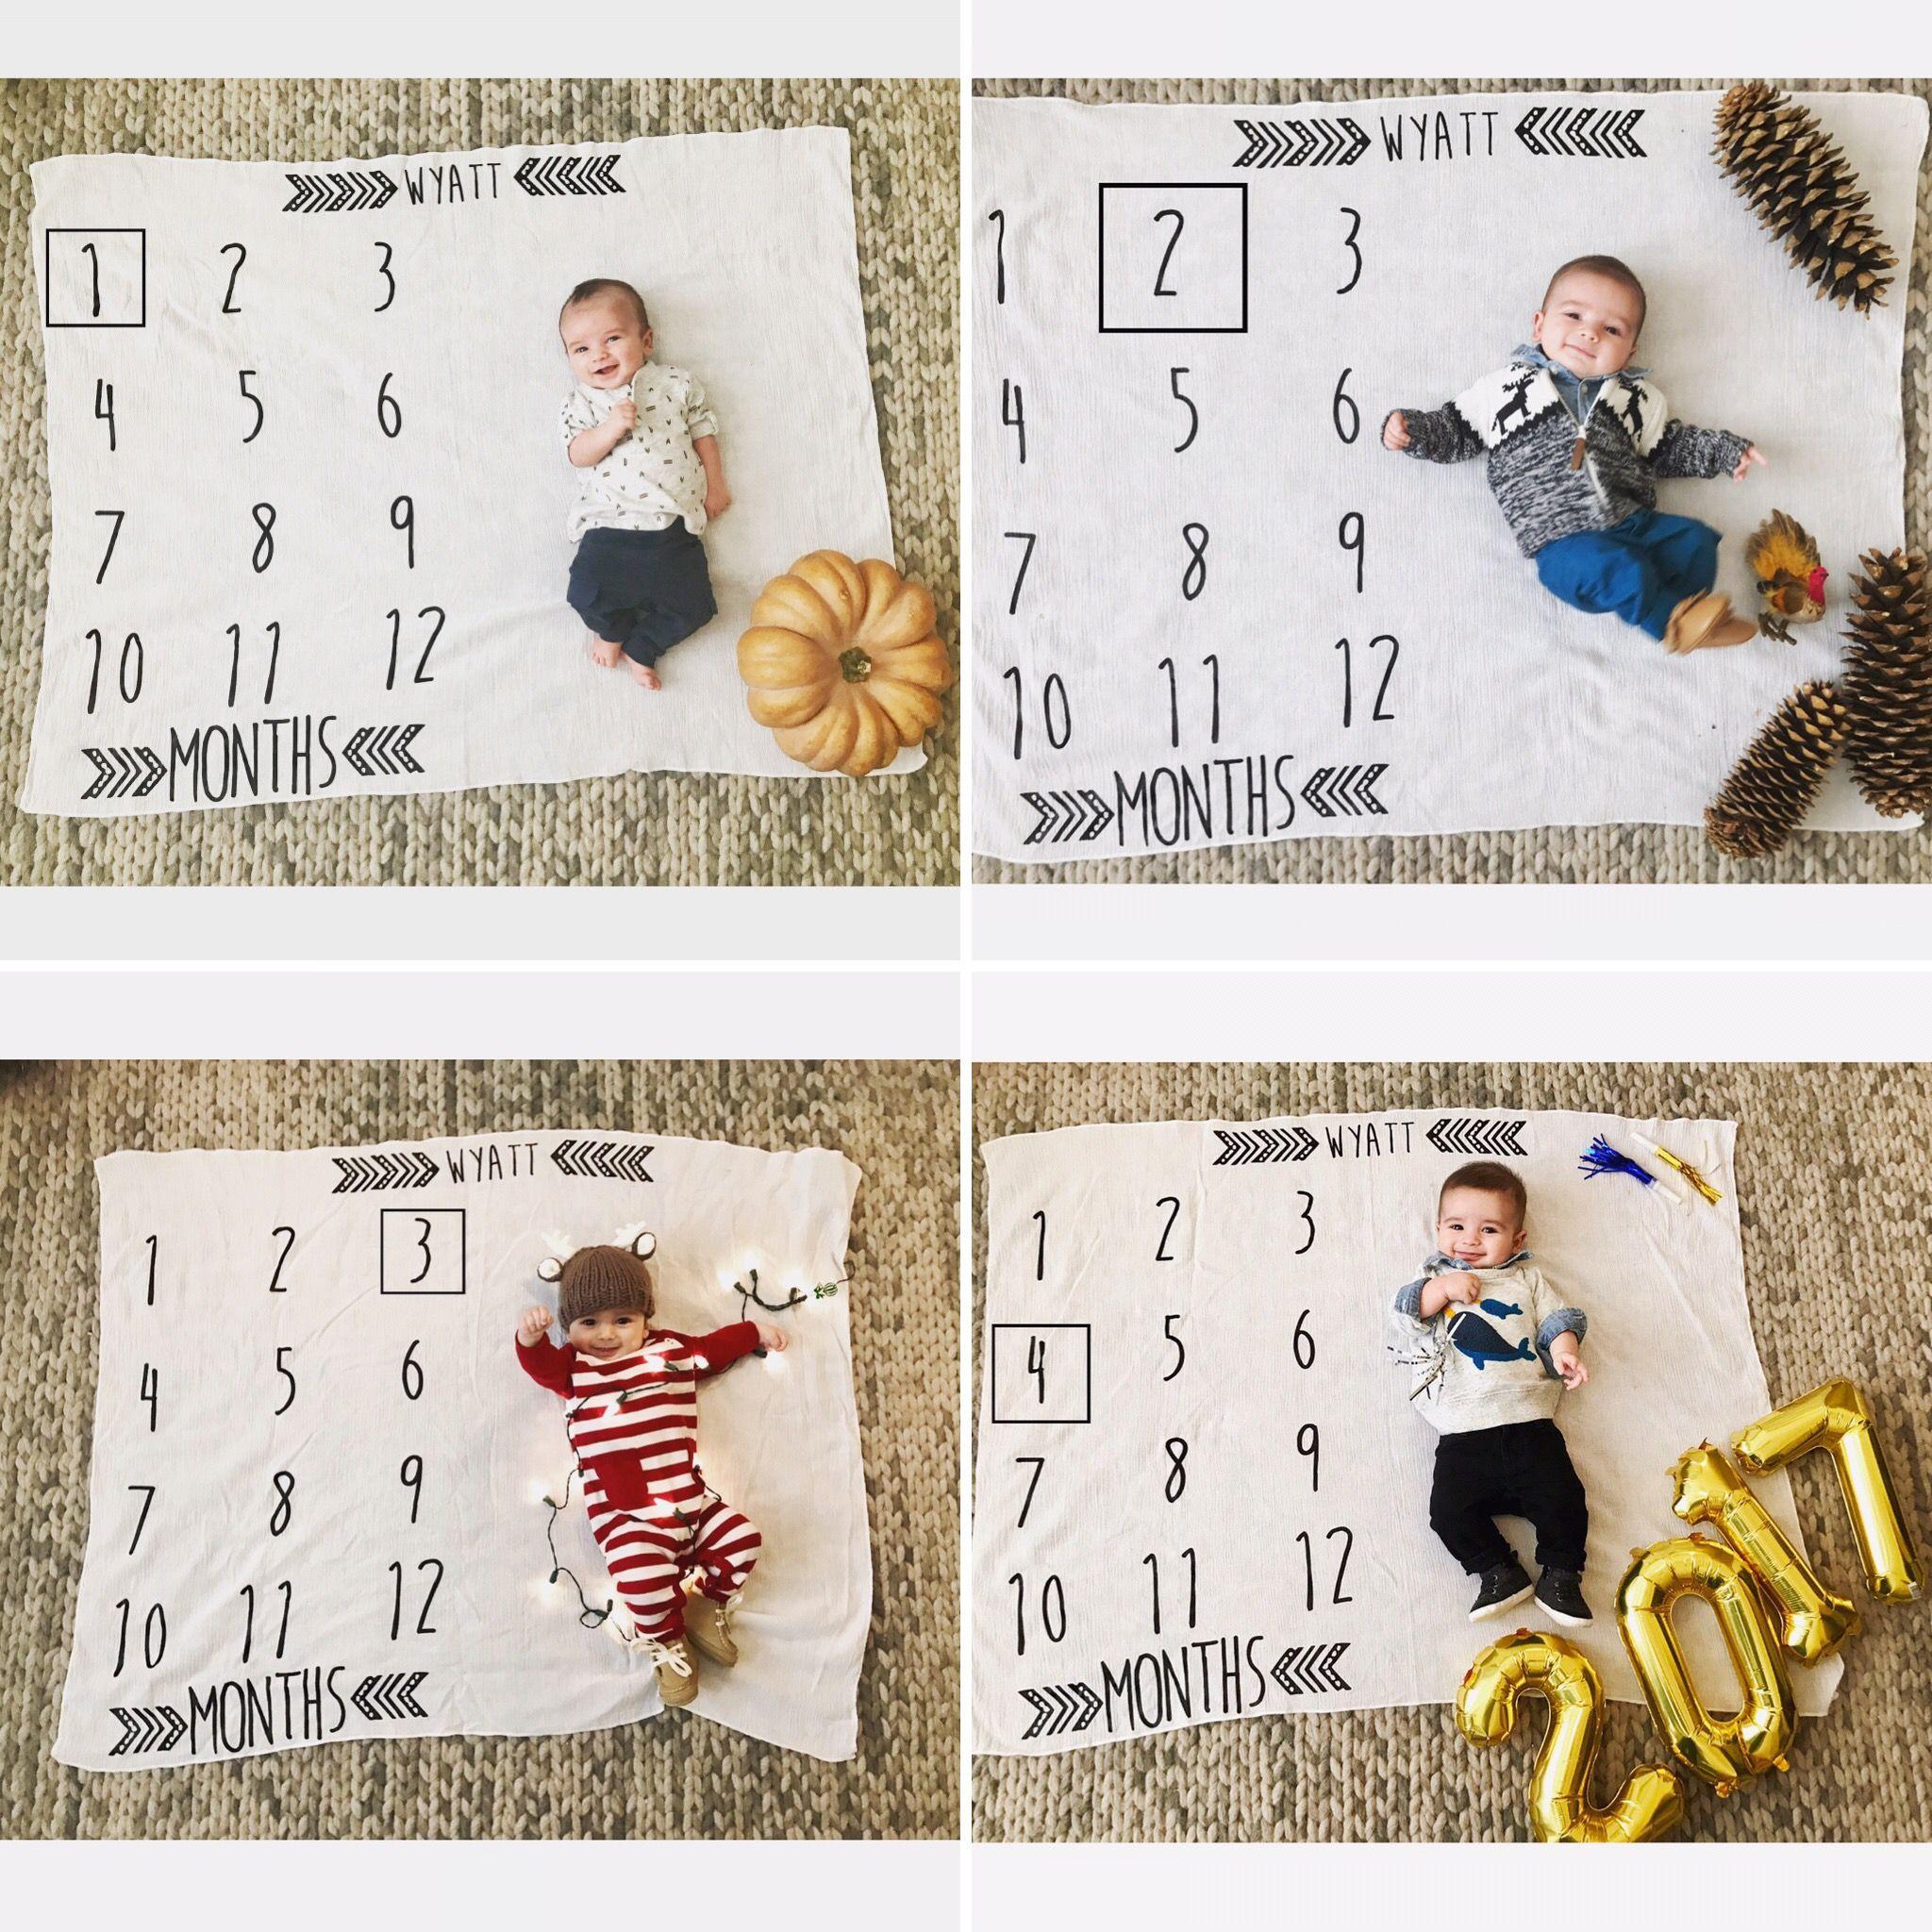 Baby Milestone Tracker Photos October November December January Baby Milestones Pictures Monthly Baby Pictures Monthly Baby Photos